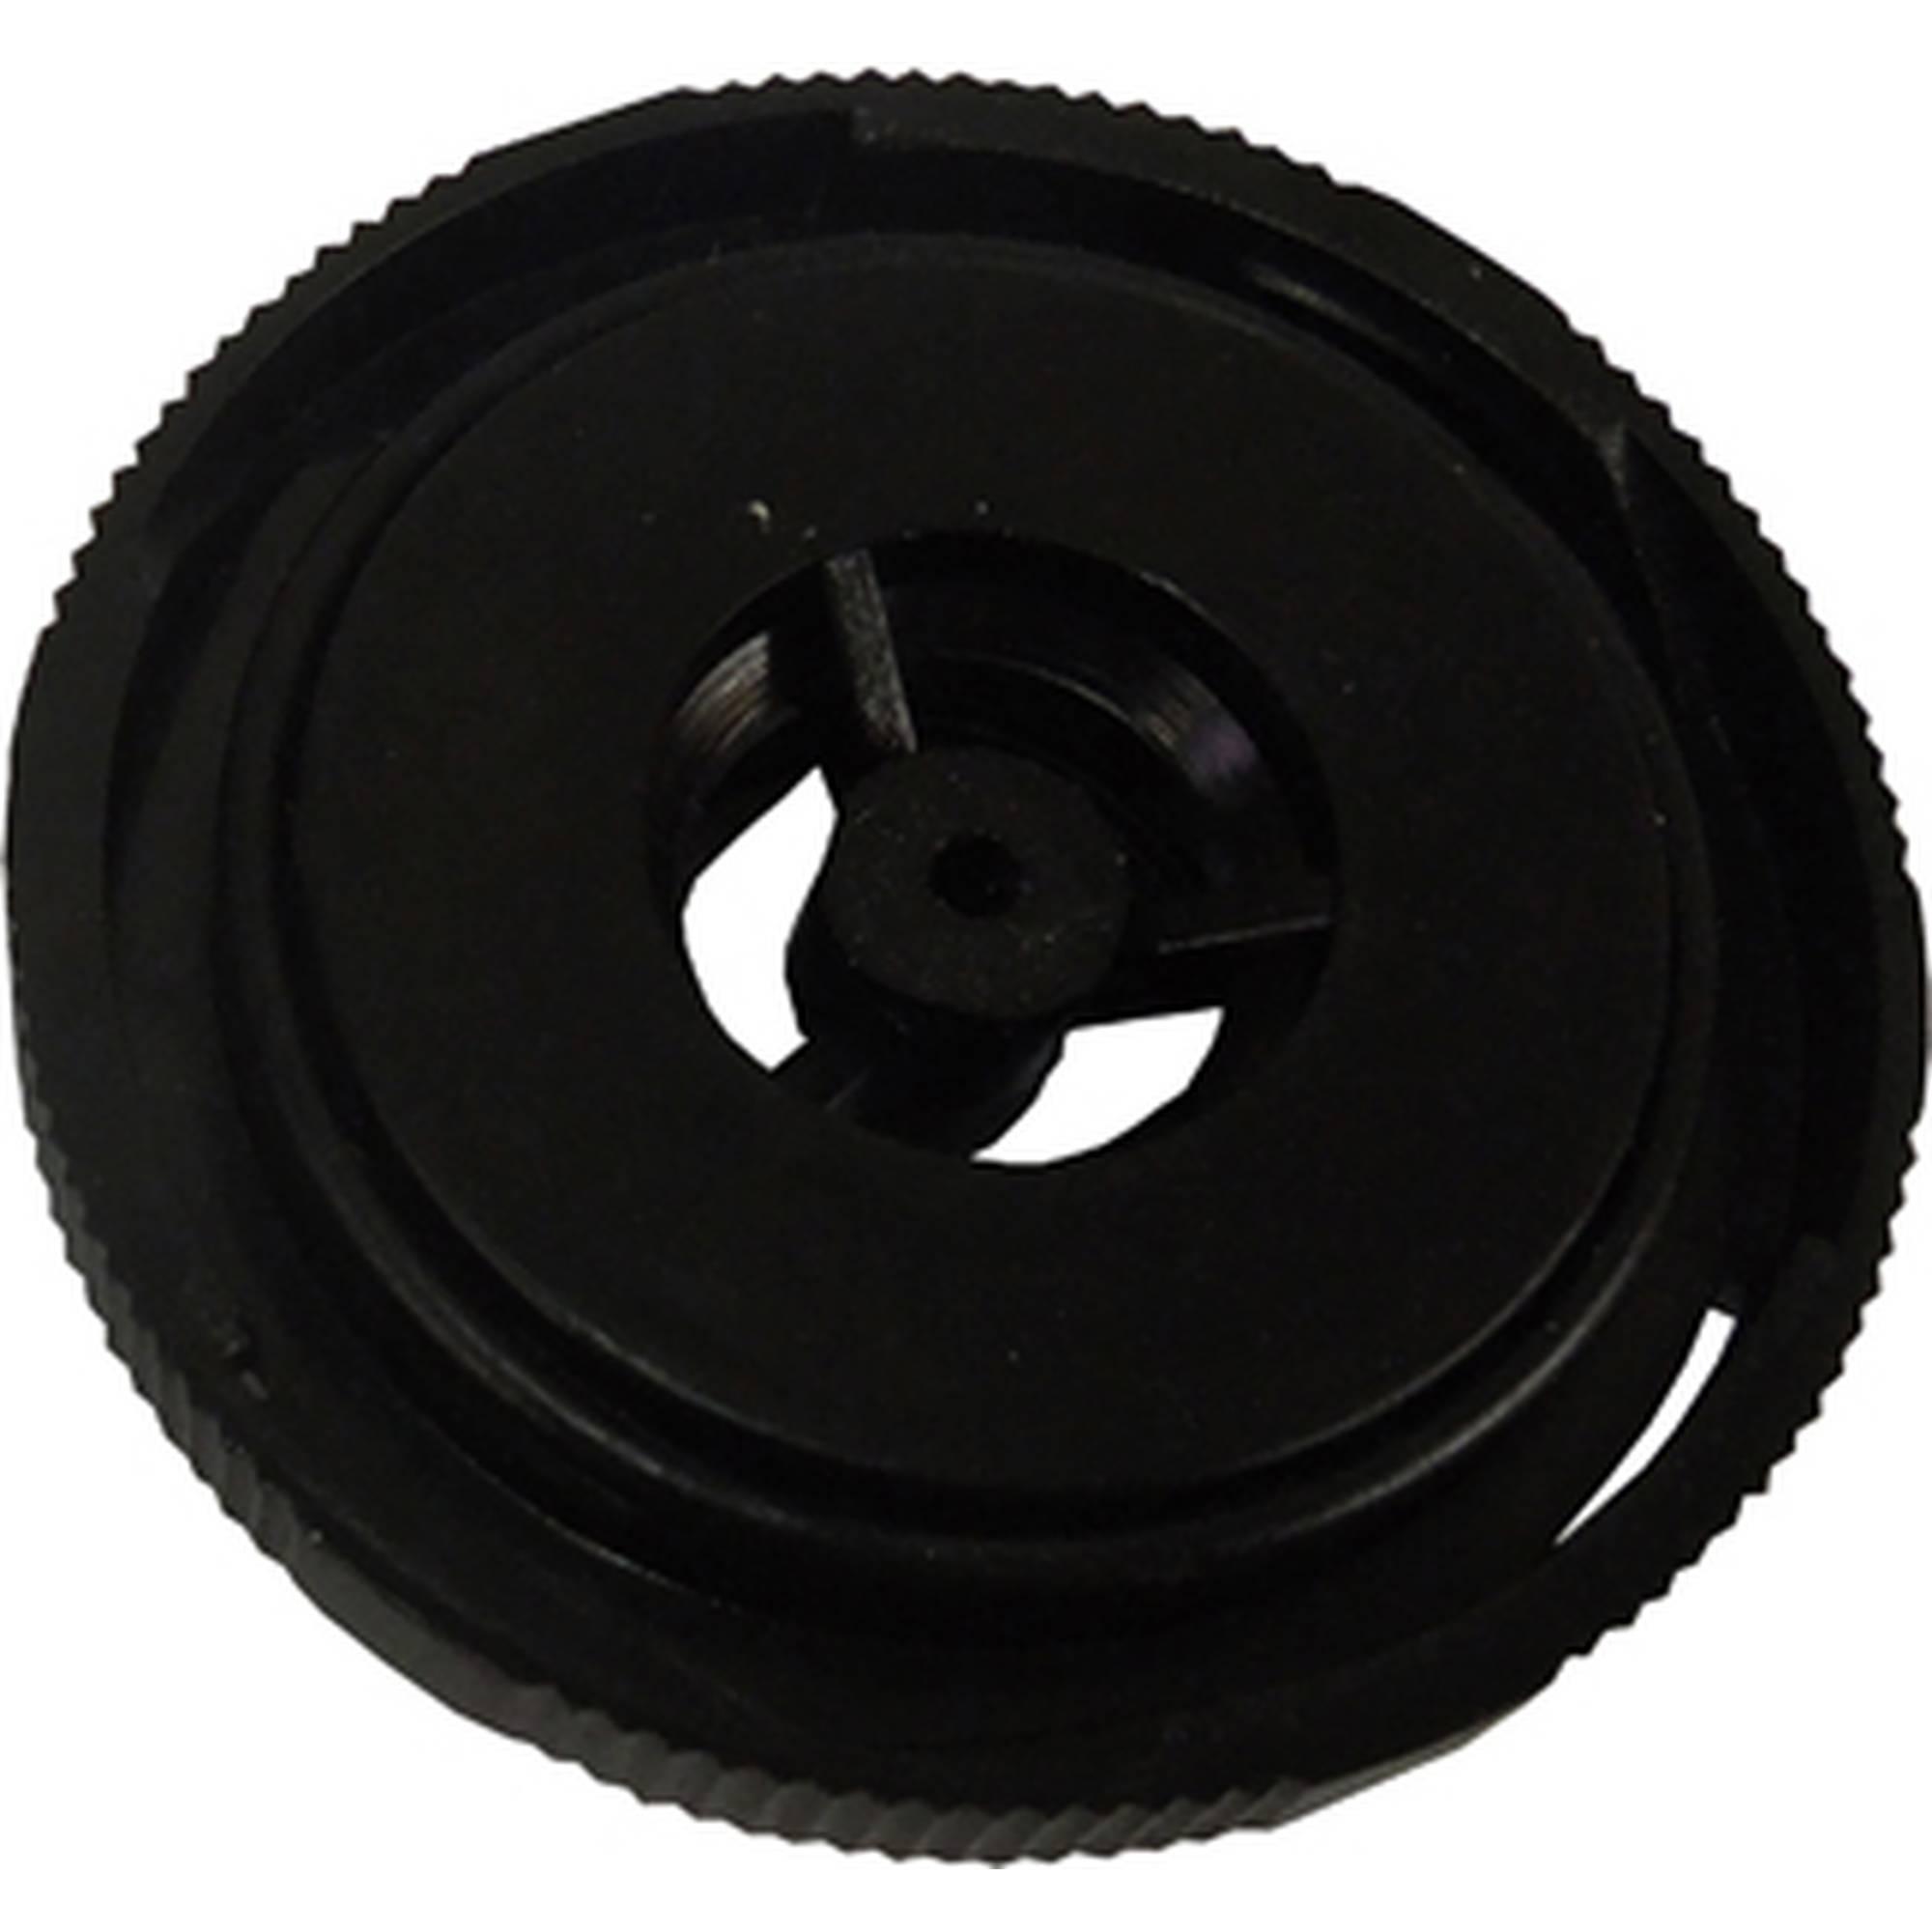 Pumpenkammerdeckel HSP3000-00